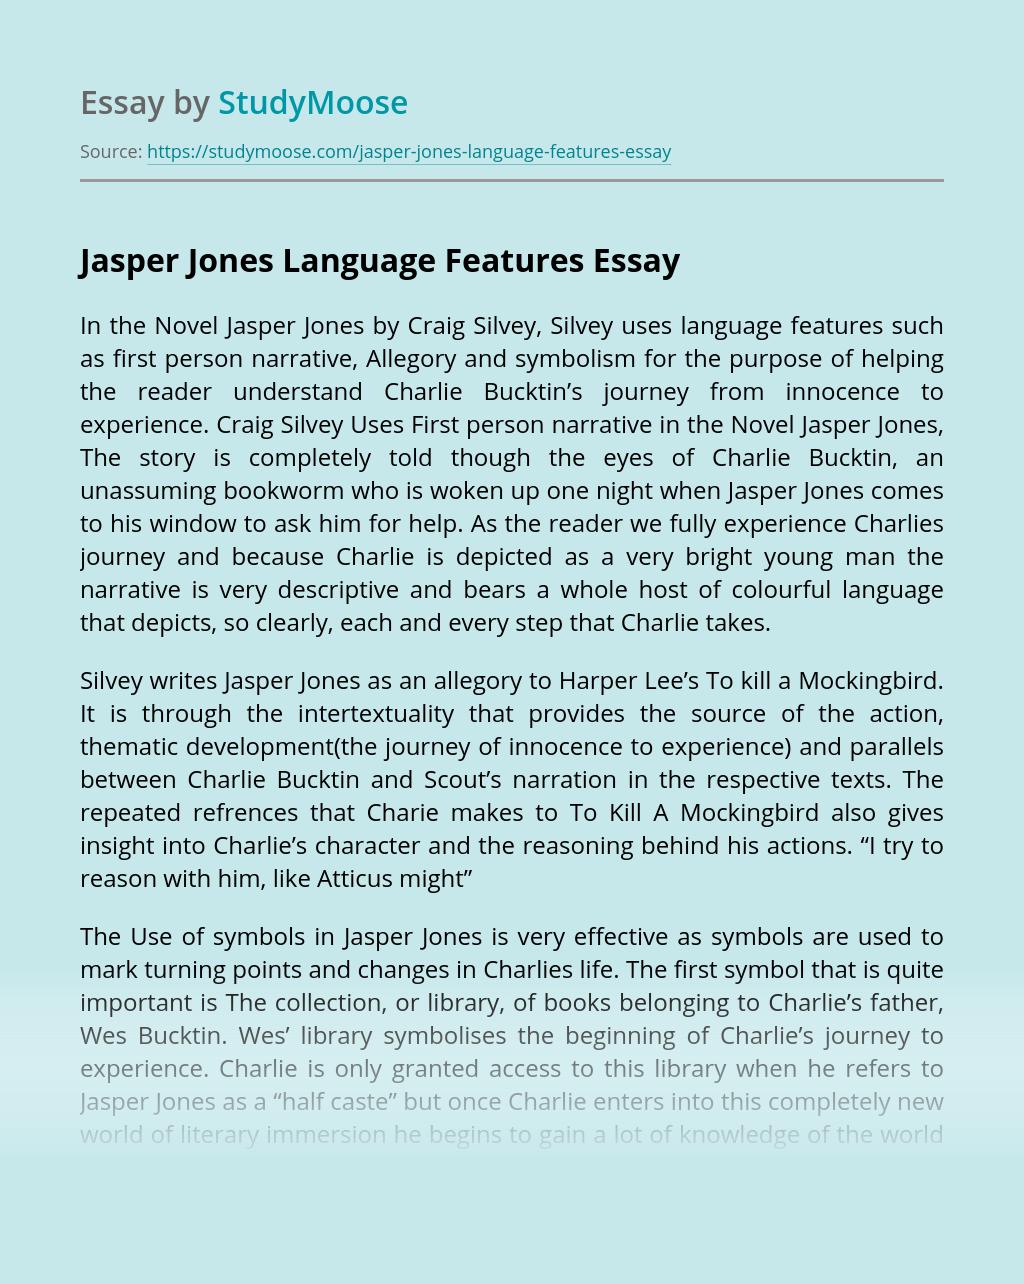 Jasper Jones Language Features